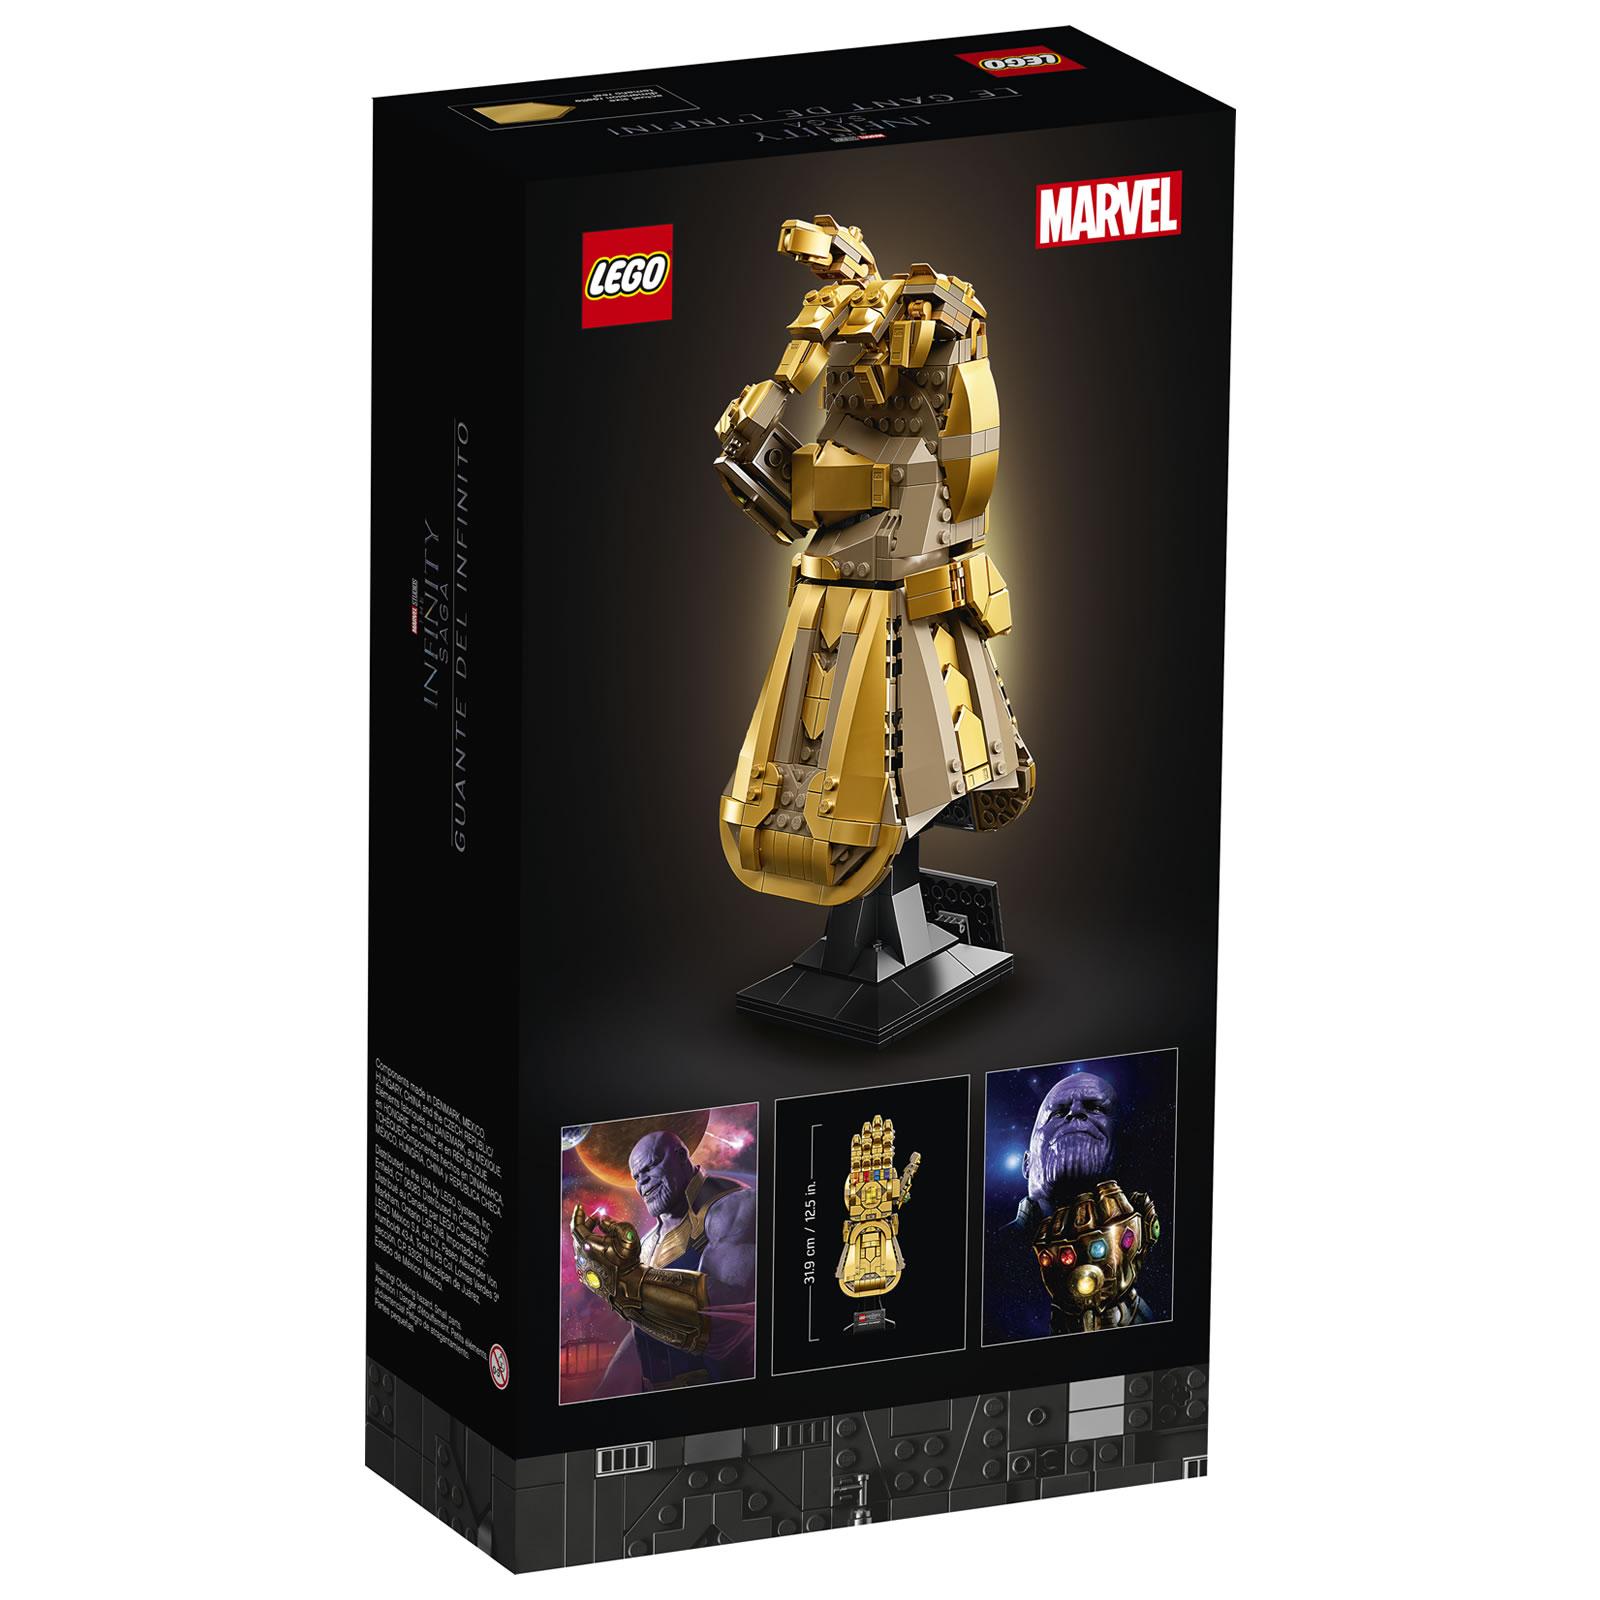 https://www.hothbricks.com/wp-content/uploads/2021/05/76191-lego-marvel-infinity-saga-infinity-gauntlet_4.jpg